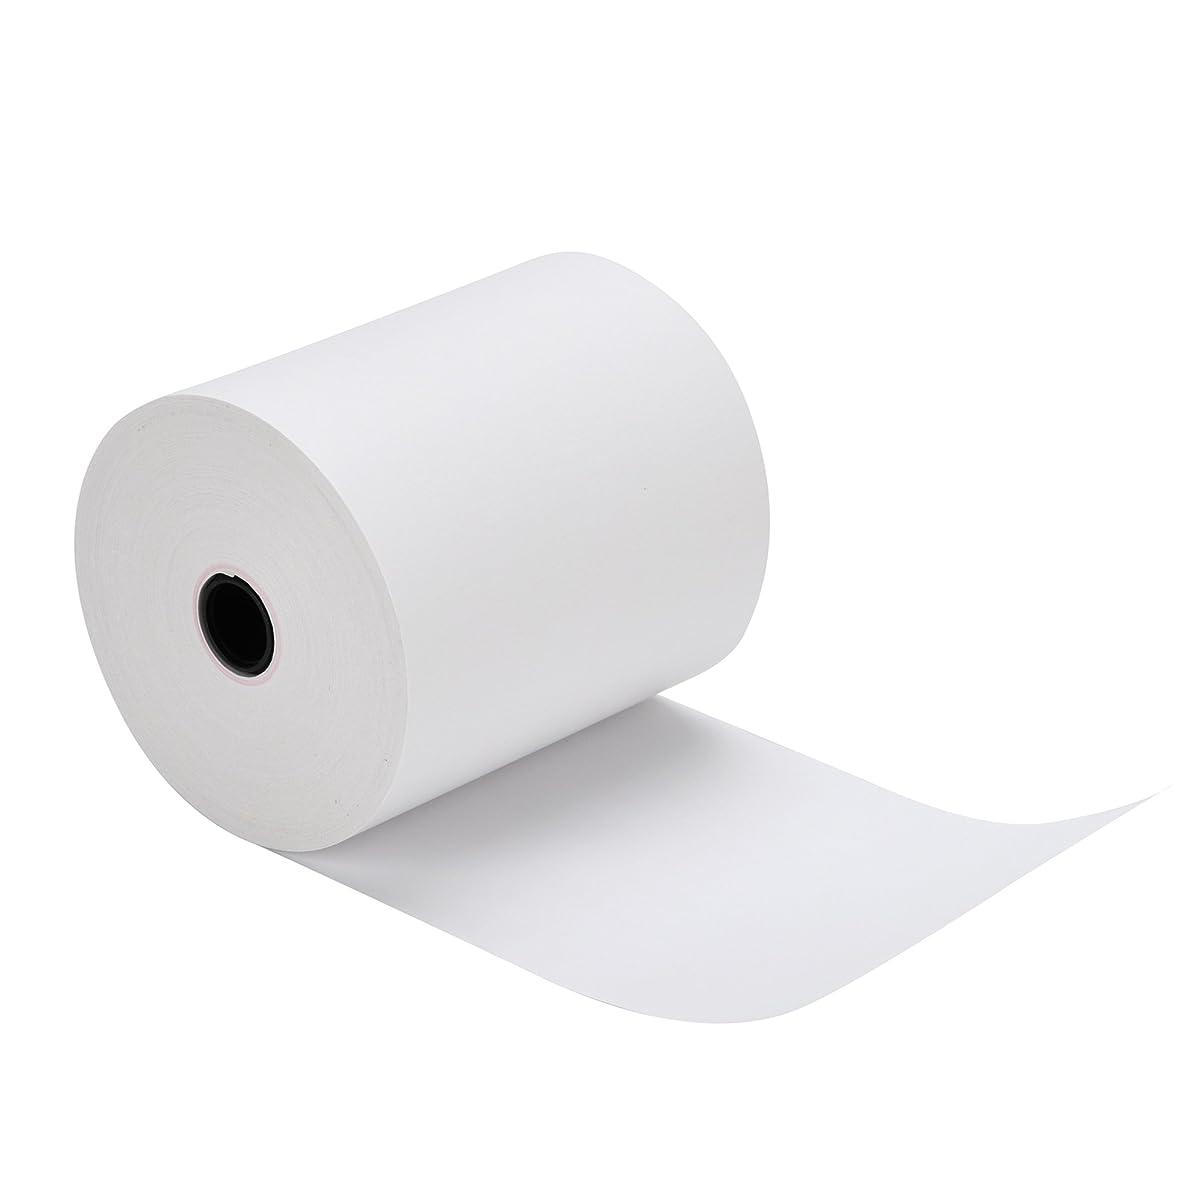 "MFLABEL 50 Rolls 2 1/4"" x 85 Thermal Paper Cash Register POS Receipt Paper"